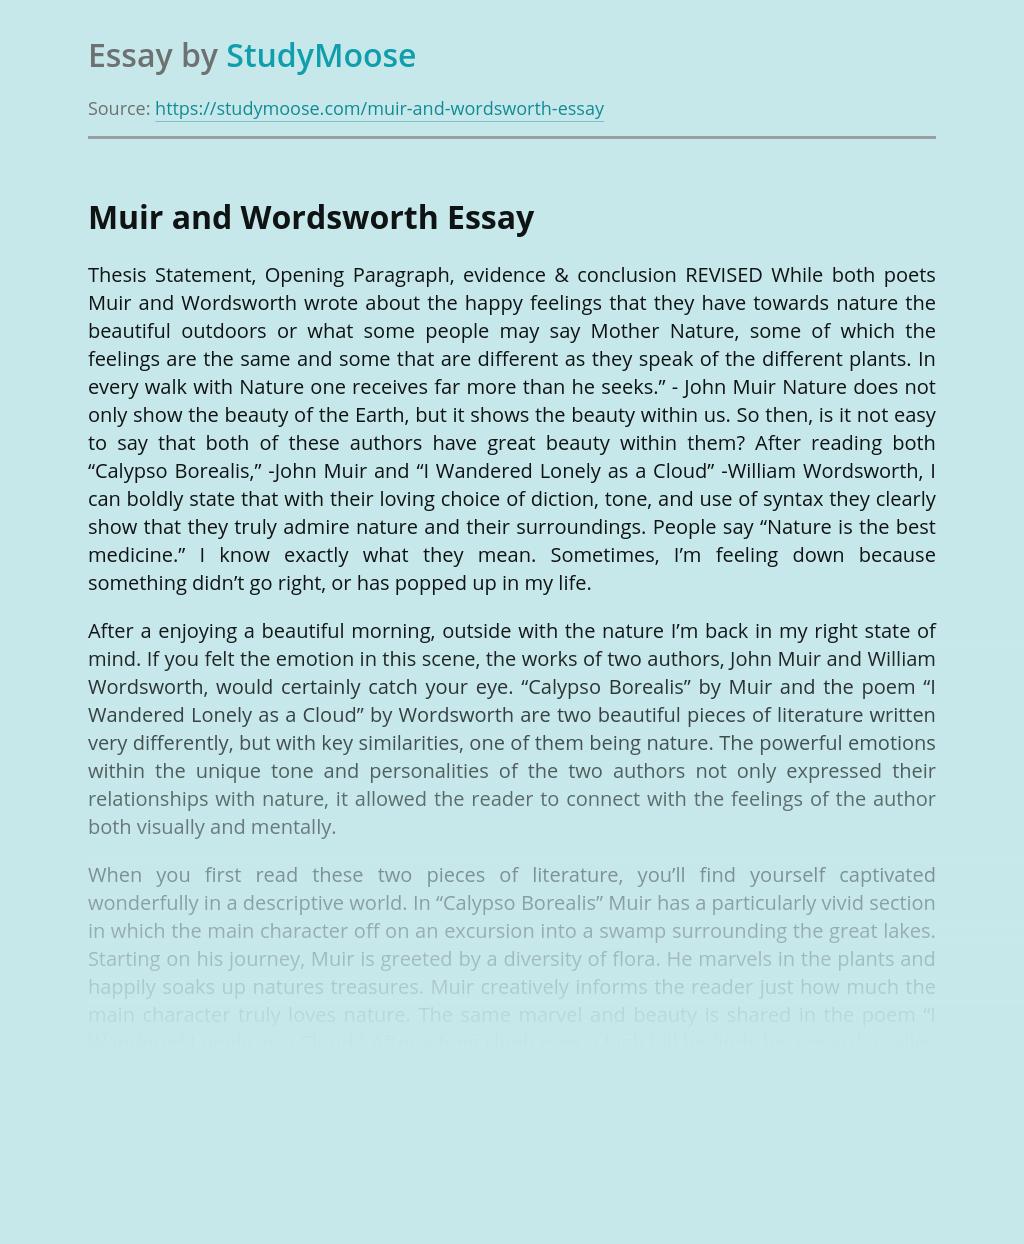 Muir and Wordsworth